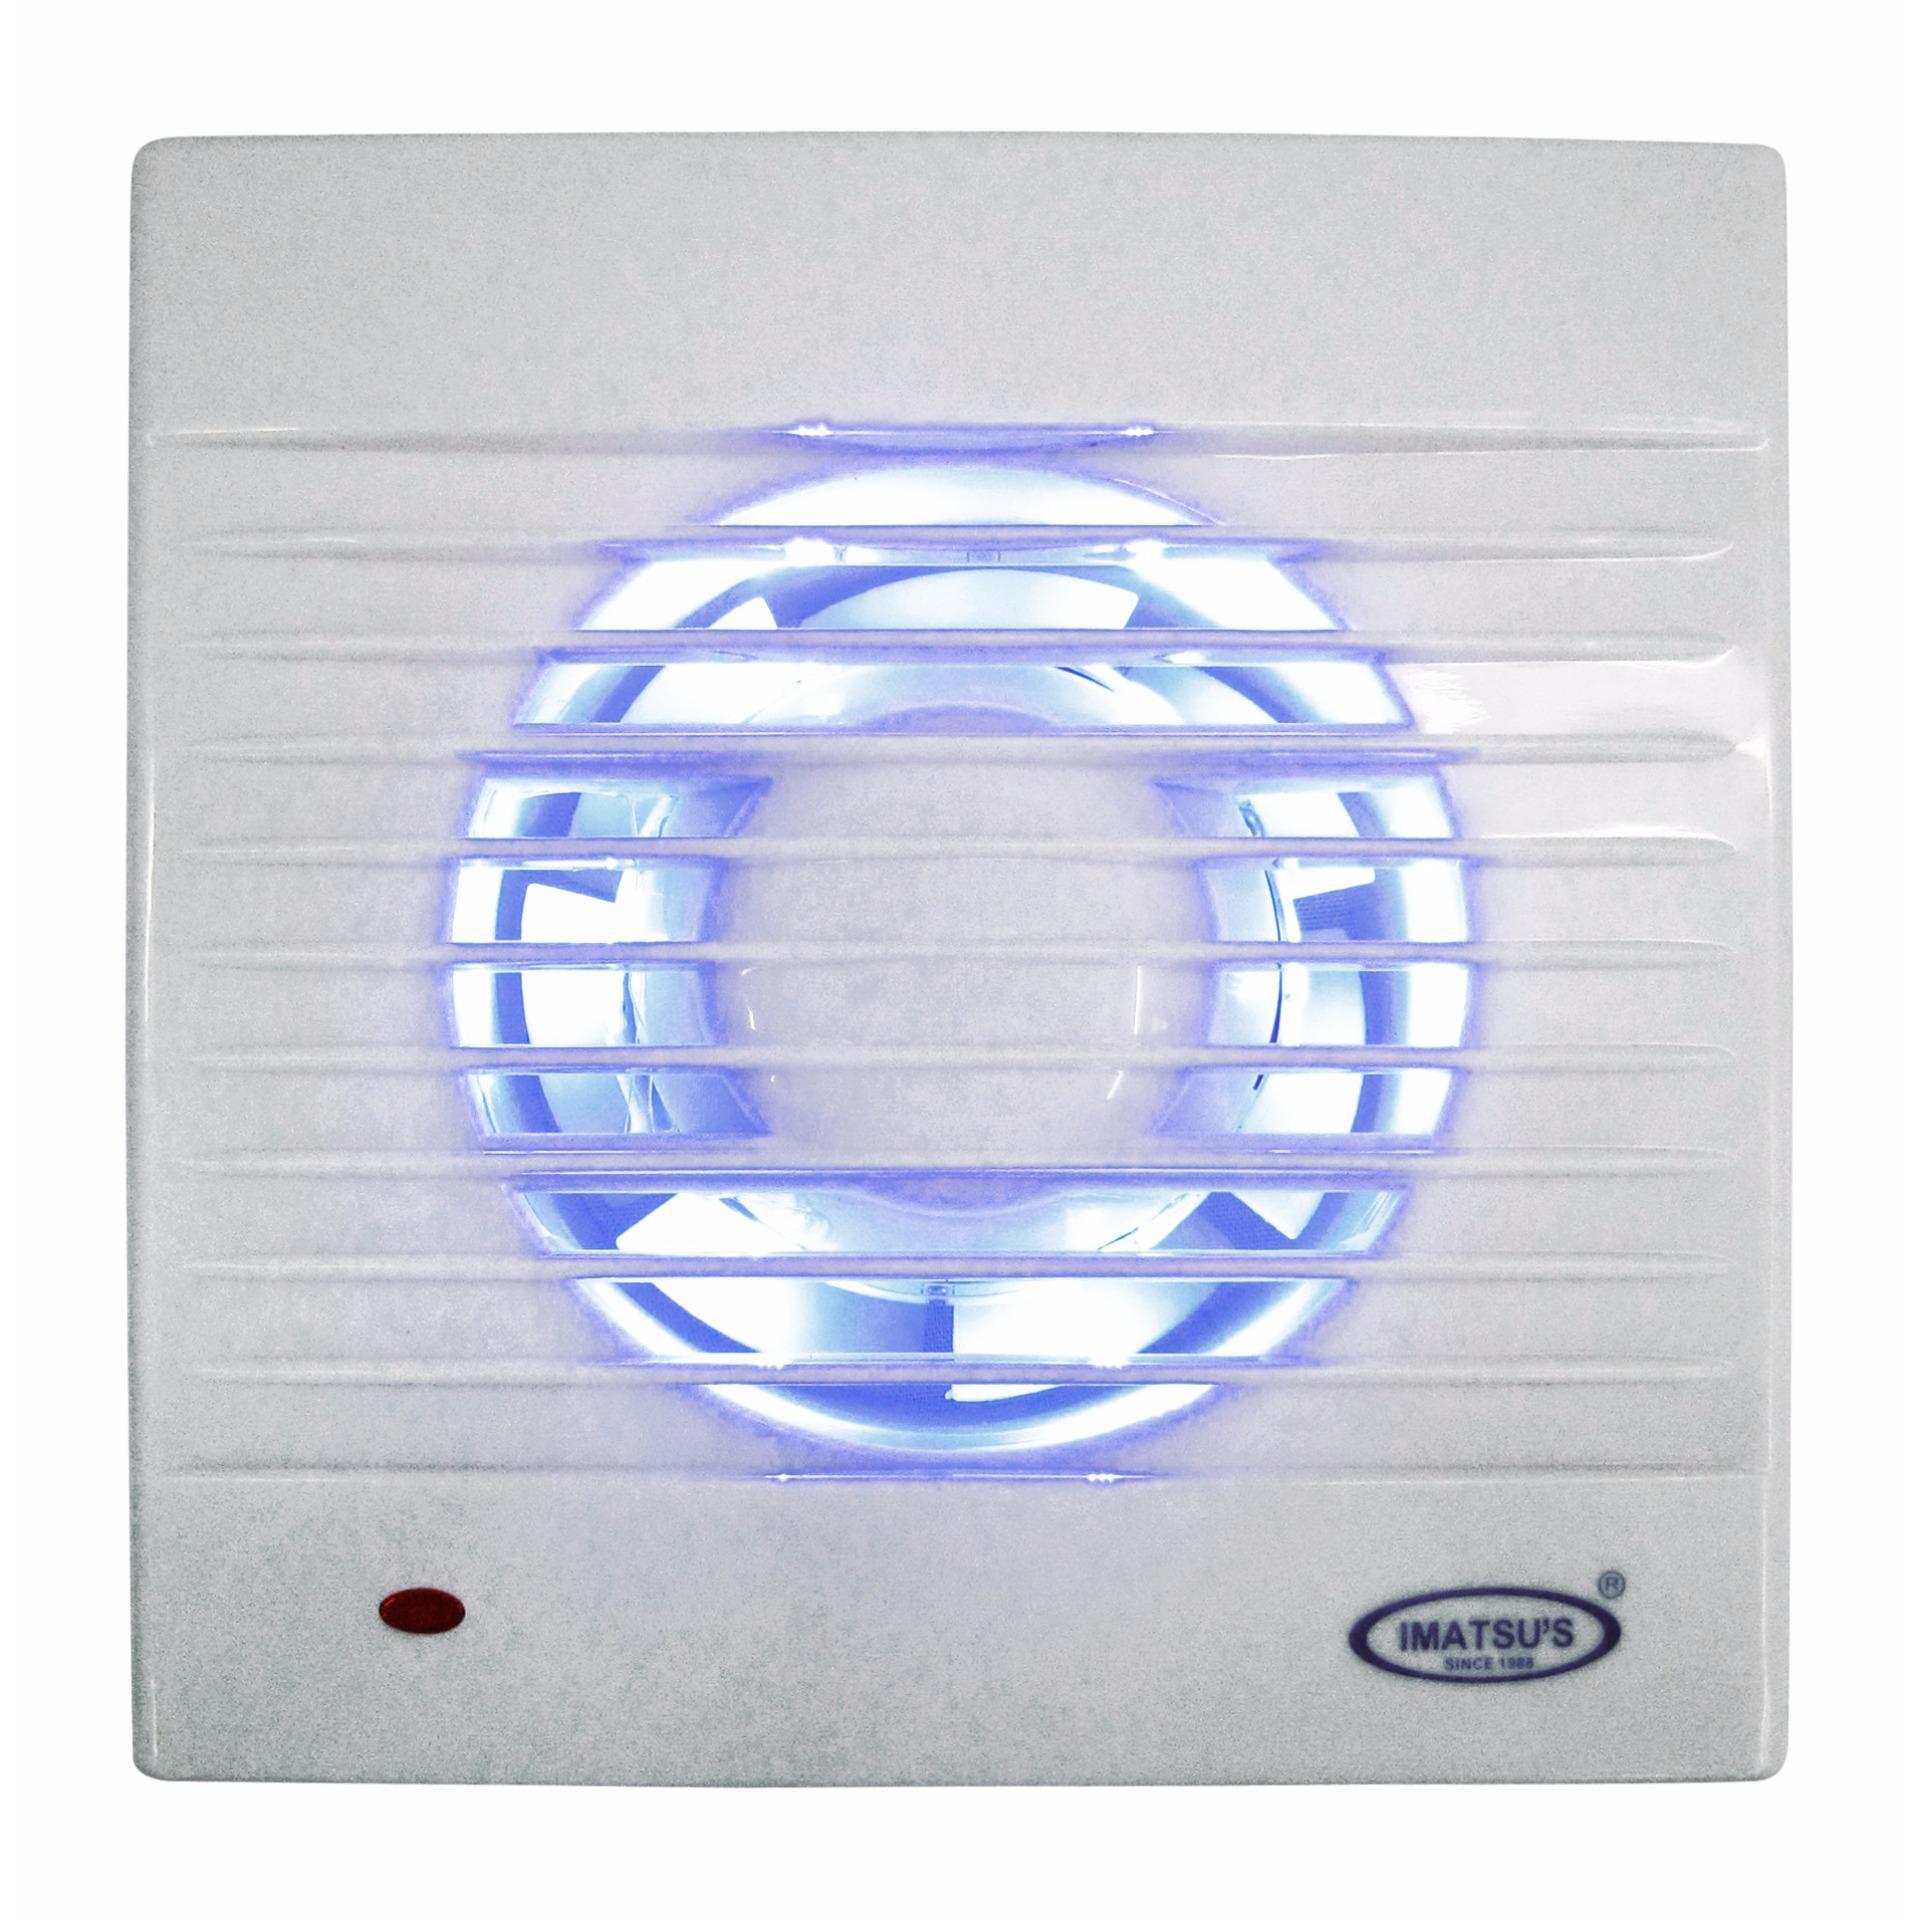 Exhaust Fan Imatsu APC12C2 With LED 5 Inch Rumah Toilet Dapur Restoran Udara Hisap Angin Nyaman